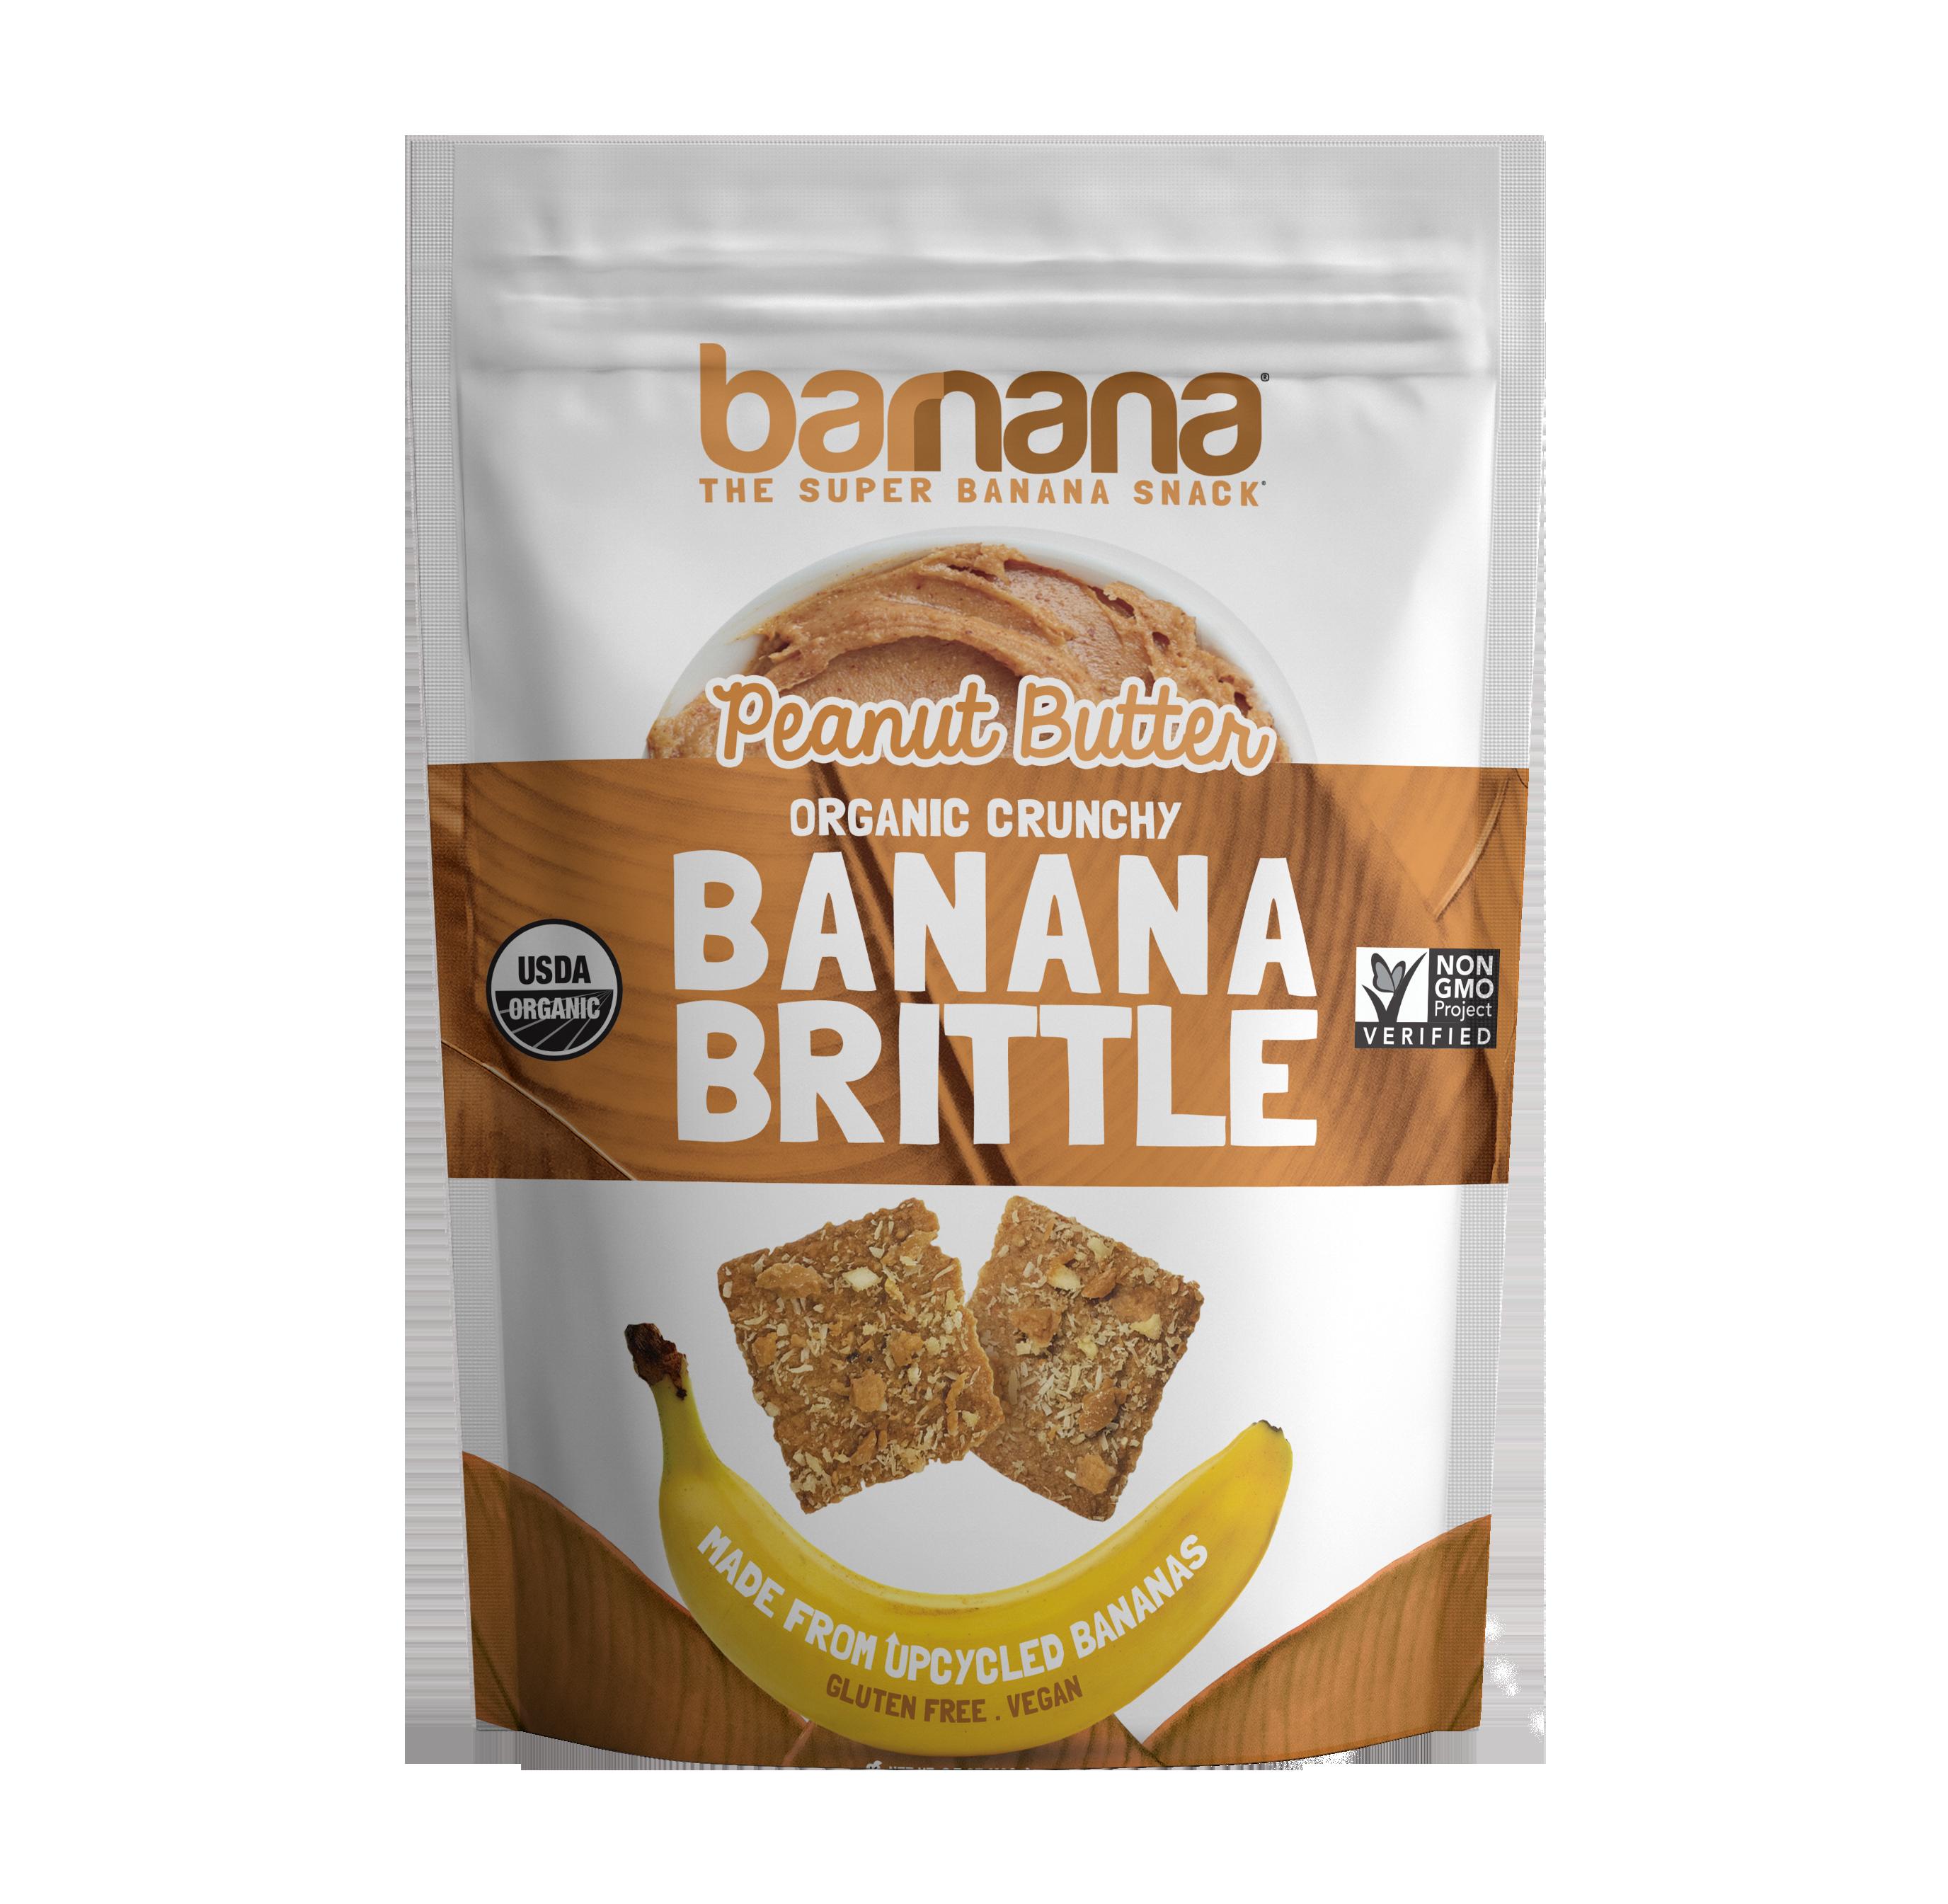 BARNANA - 2018 BRITTLE MOCK UP - PEANUT BUTTER TRANSPARENT (1)